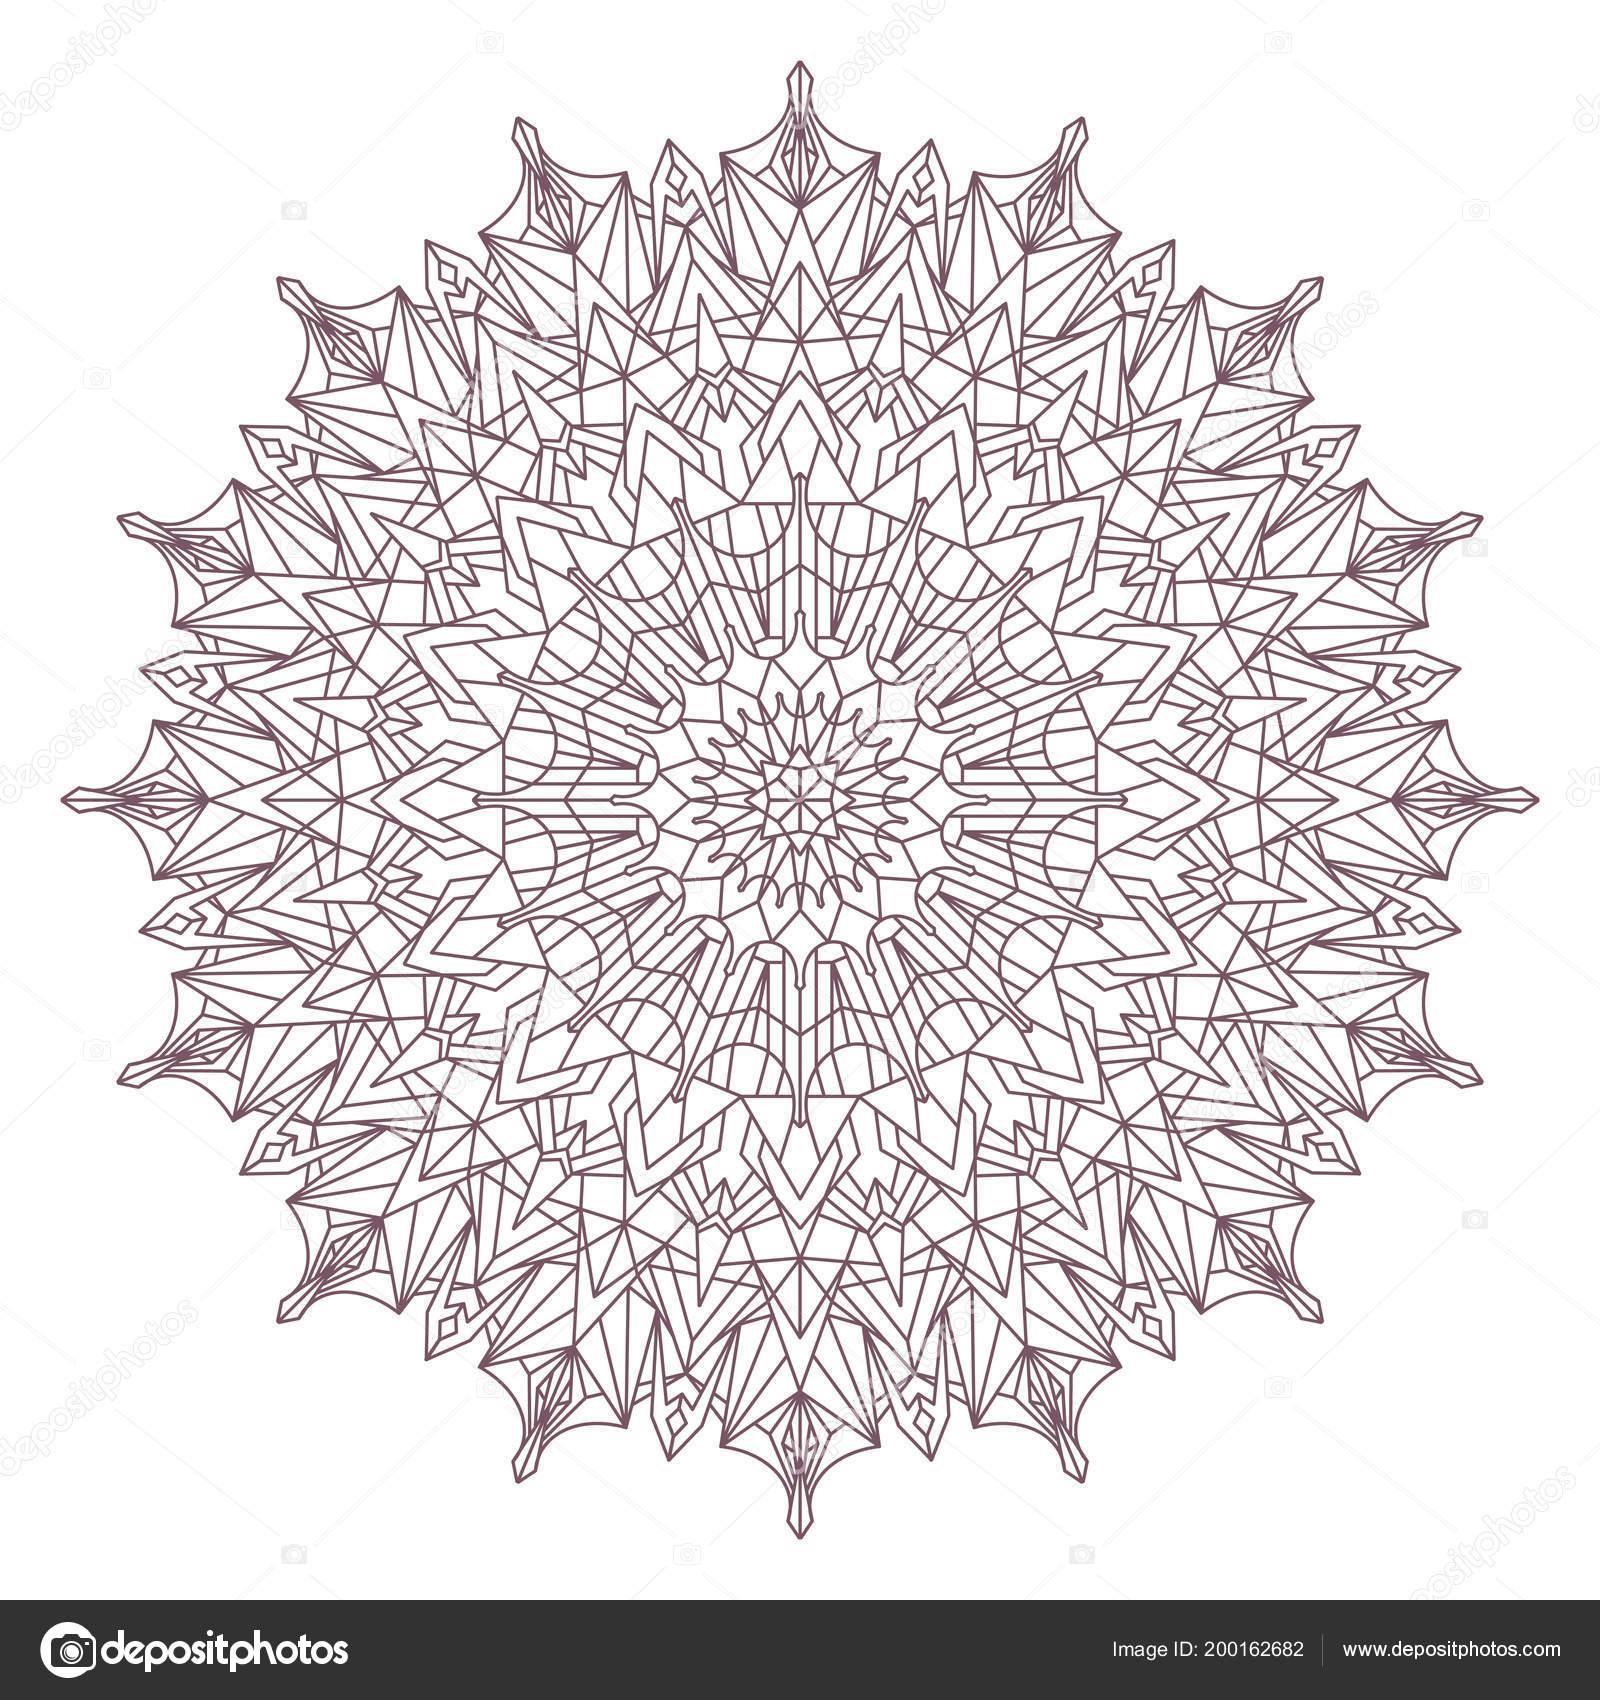 Línea Arte Circular Intrincado Mandala Diseñado Para Colorear ...